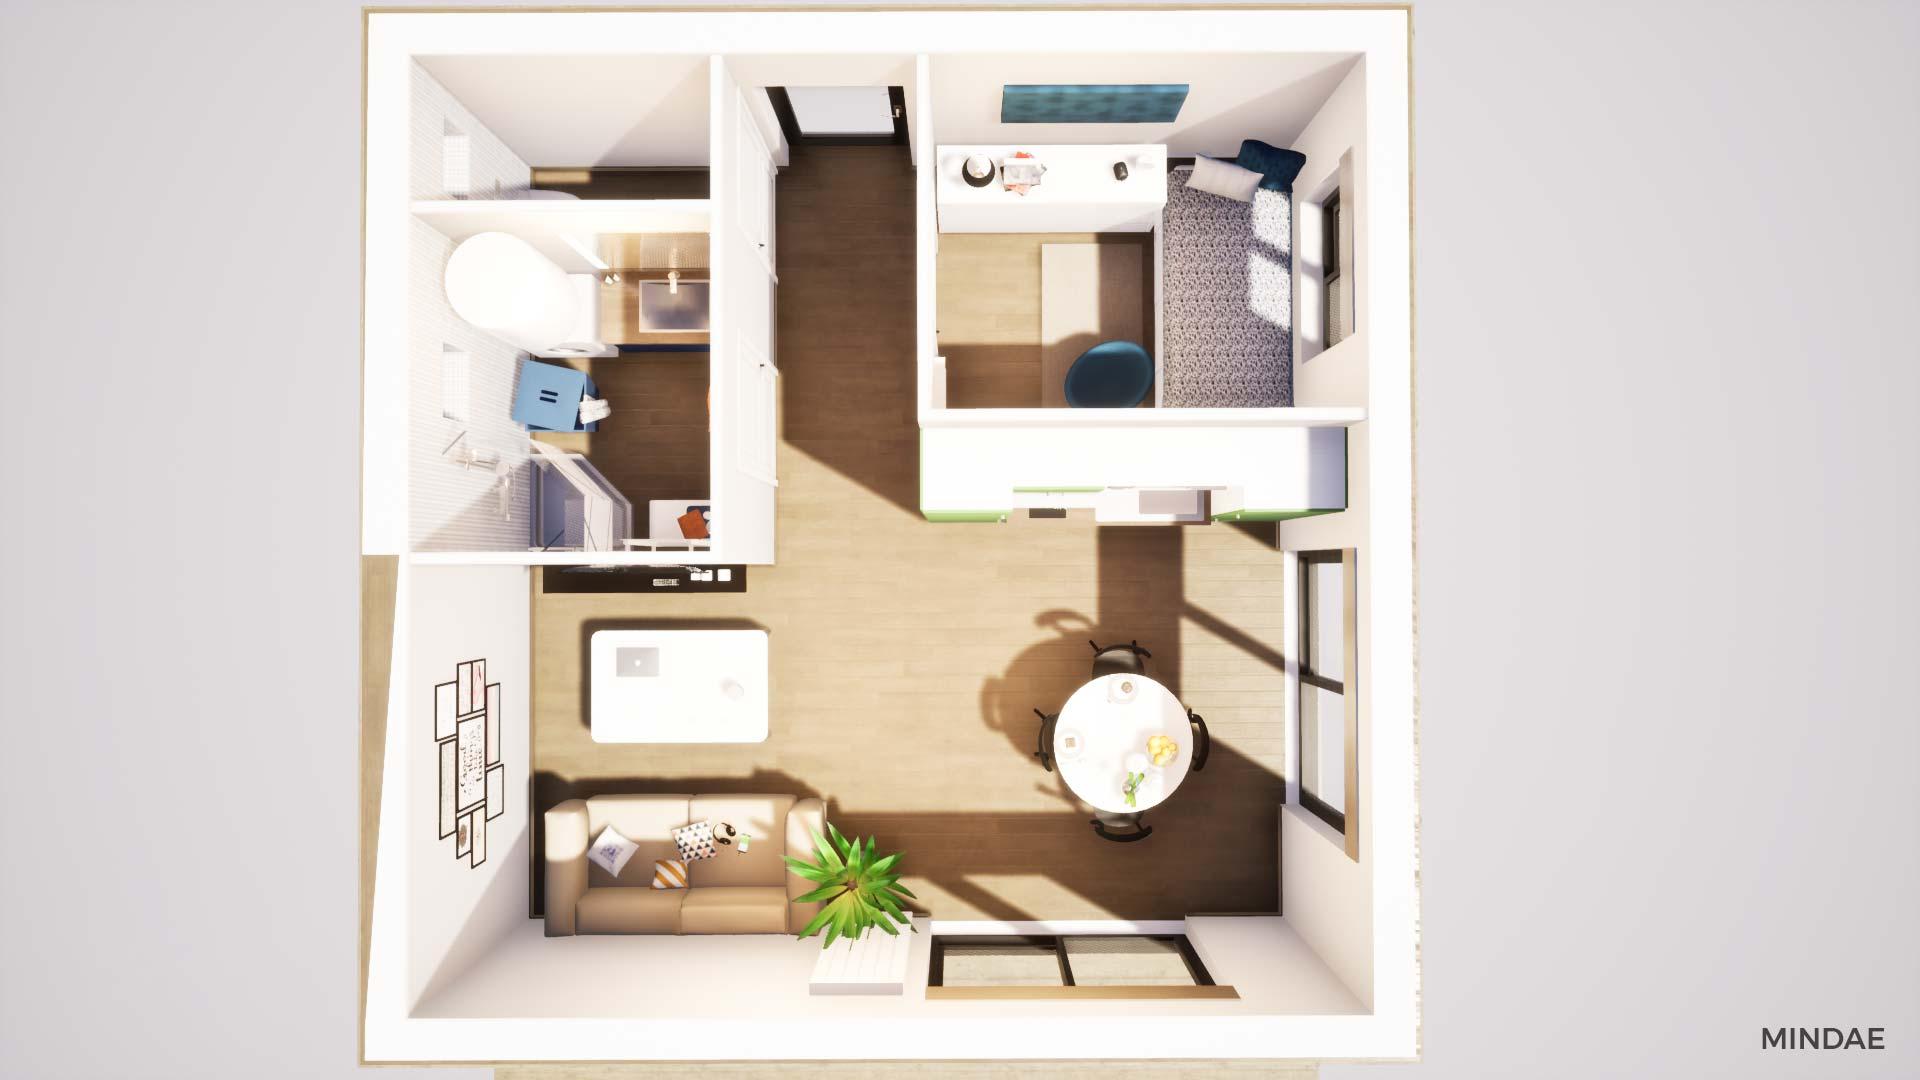 Mindae_3D_appartement_studio_étudiant_homestaging_immobilier_location-(0)